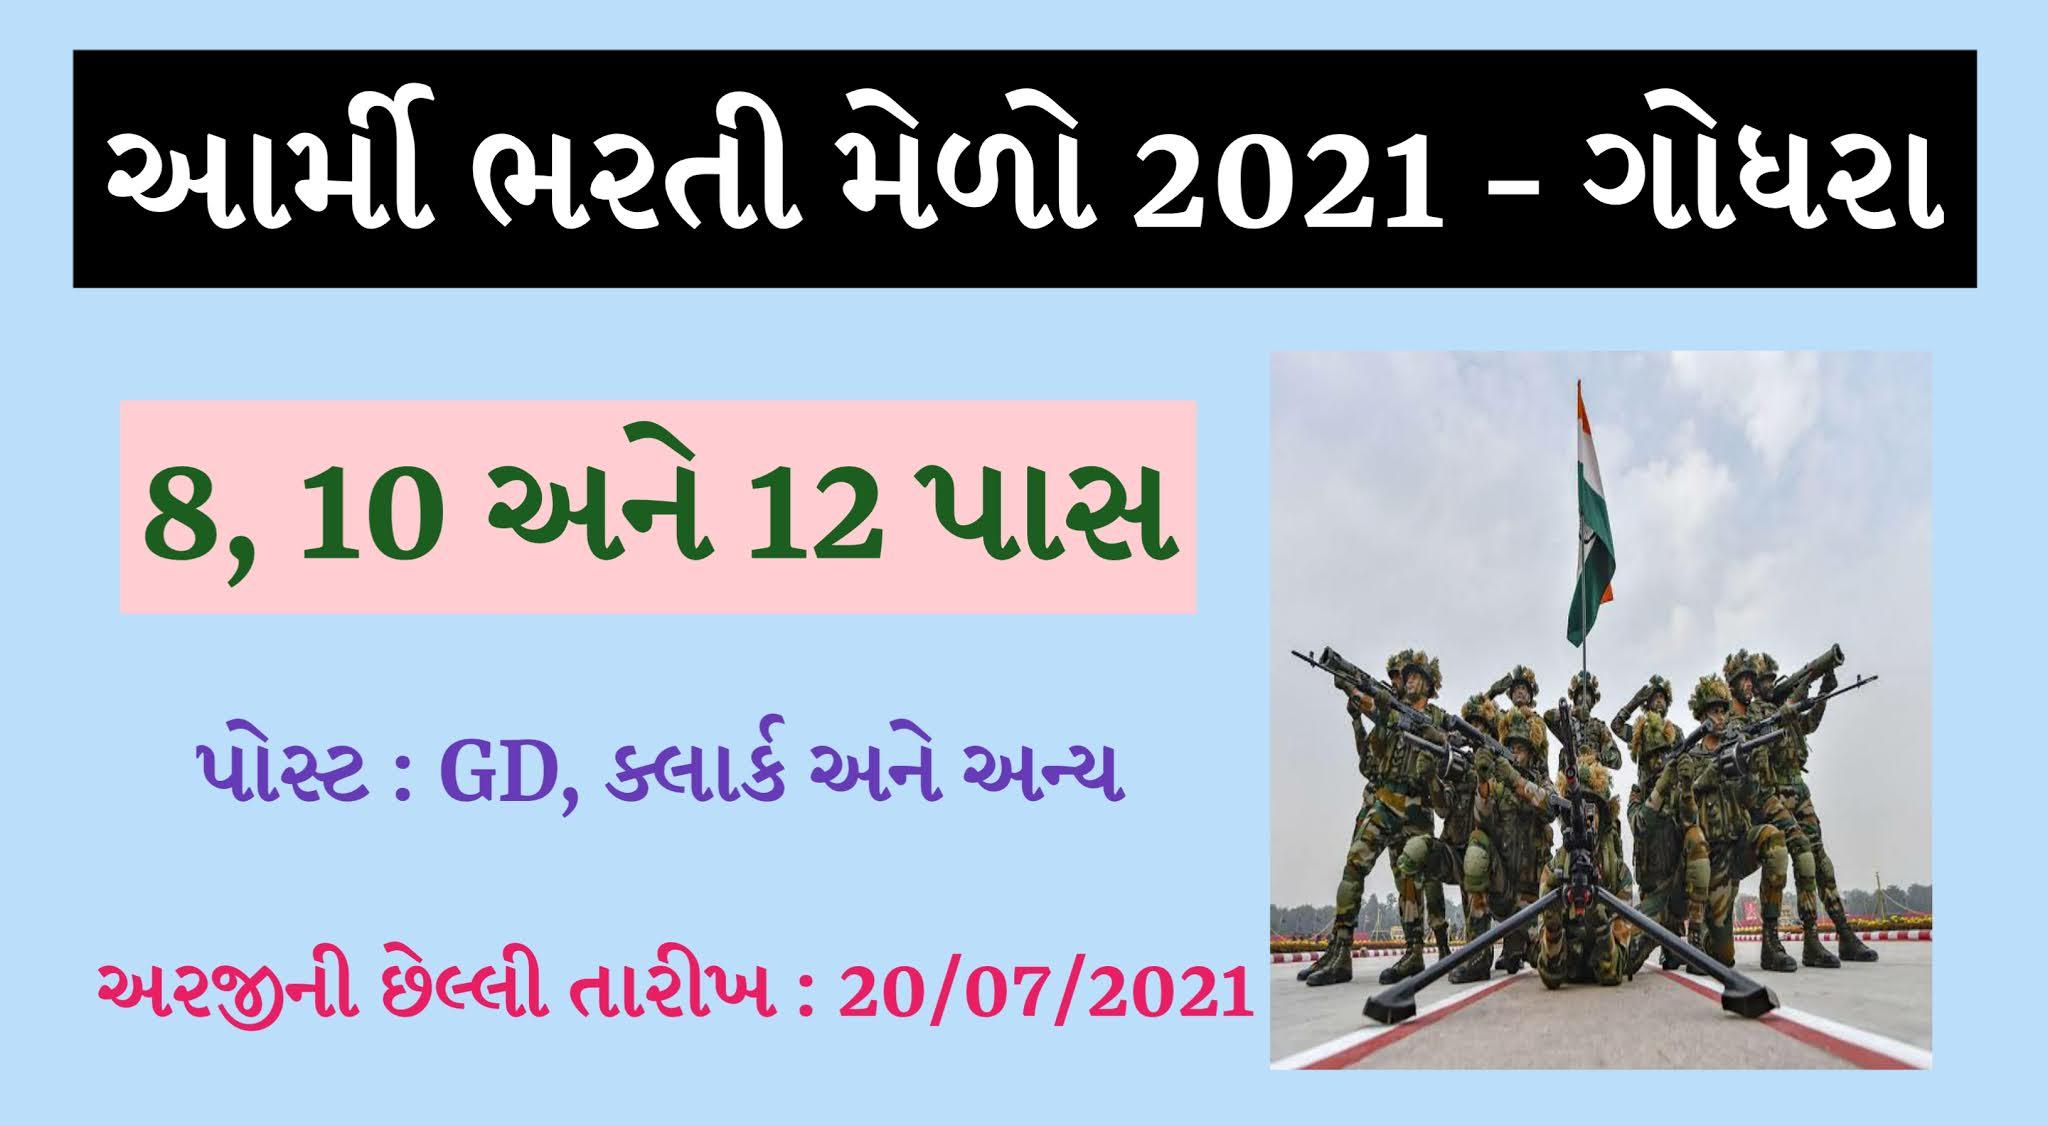 army bharti 2021, army bharti, army bharti date, army bharti 2021 gujarat date, army bharti 2021 gujarat, army bharti 2021 gujarat godhra, indian army bharti 2021 gujarat, army bharti 2021 gujarat godhra, indian army bharti 2021, indian army bharti 2021 8th pass, army bharti 2021 8th pass, army bharti 2021 10th pass, indian army bharti 2021 10th pass, indian army bharti 2021 12th pass, army bharti 2021 12th pass, soldier general duty recruitment 2021, soldier tradesman duty receuitment 2021, soldier technical recruitment 2021, soldier nursing assistant recruitment 2021, soldier nursing assistant vacancy 2021, soldier Nursing Assistant Veterinary, Soldier Clerk recruitment 2021, Store Keeper Technical recruitment 2021, Inventory Management recruitment 2021, army bharti melo 2021, army bharti mela 2021, army bharti mela, army bharti melo, army recruitment 2021, Indian Army Recruitment 2021, Ahmedabad Army Recruitment Rally 2021, Ahmedabad Army Bharti Melo, Ahmedabad Army Bharti Melo 2021, Ahmedabad army Bharti, Ahmedabad Army Bharti 2021, Ahmedabad Army Recruitment 2021, Ahmedabad Army Recruitment, Ahmedabad Army Recruitment Rally, Godhara Army Rally Registration, Indian Army Open Bharti Melo Godhra 2021, Indian Army Bharti Gujarat 2021, અમદાવાદ આર્મી ભરતી મેળો | અમદાવાદ આર્મી ભરતી, અમદાવાદ આર્મી ભરતી 2021, ગોધરા આર્મી ભરતી મેળો, ગોધરા આર્મી ભરતી મેળો 2021, Army Bharati Melo 2021, army bharti 2021 ahmedabad, army bharti 2021 date, Army Bharti 2021 Godhara, Gujarat Army Bharti Rally 2021-22, Indian Army Recruitment 2021-22, ARMY Recruitment Rally (for MEN) at GODHRA, PANCHMAHAL, Indian Army Rally Notification 2020-2021, Indian Army Bharti 2021 Gujarat, Army Bharti 2021 Ahmedabad, Indian Army Bharti Gujarat Date, Indian Army Bharti Gujarat Date Ahmedabad, Gujarat Army Bharti 2021, ARO Ahmedabad Army Recruitment Rally 2021